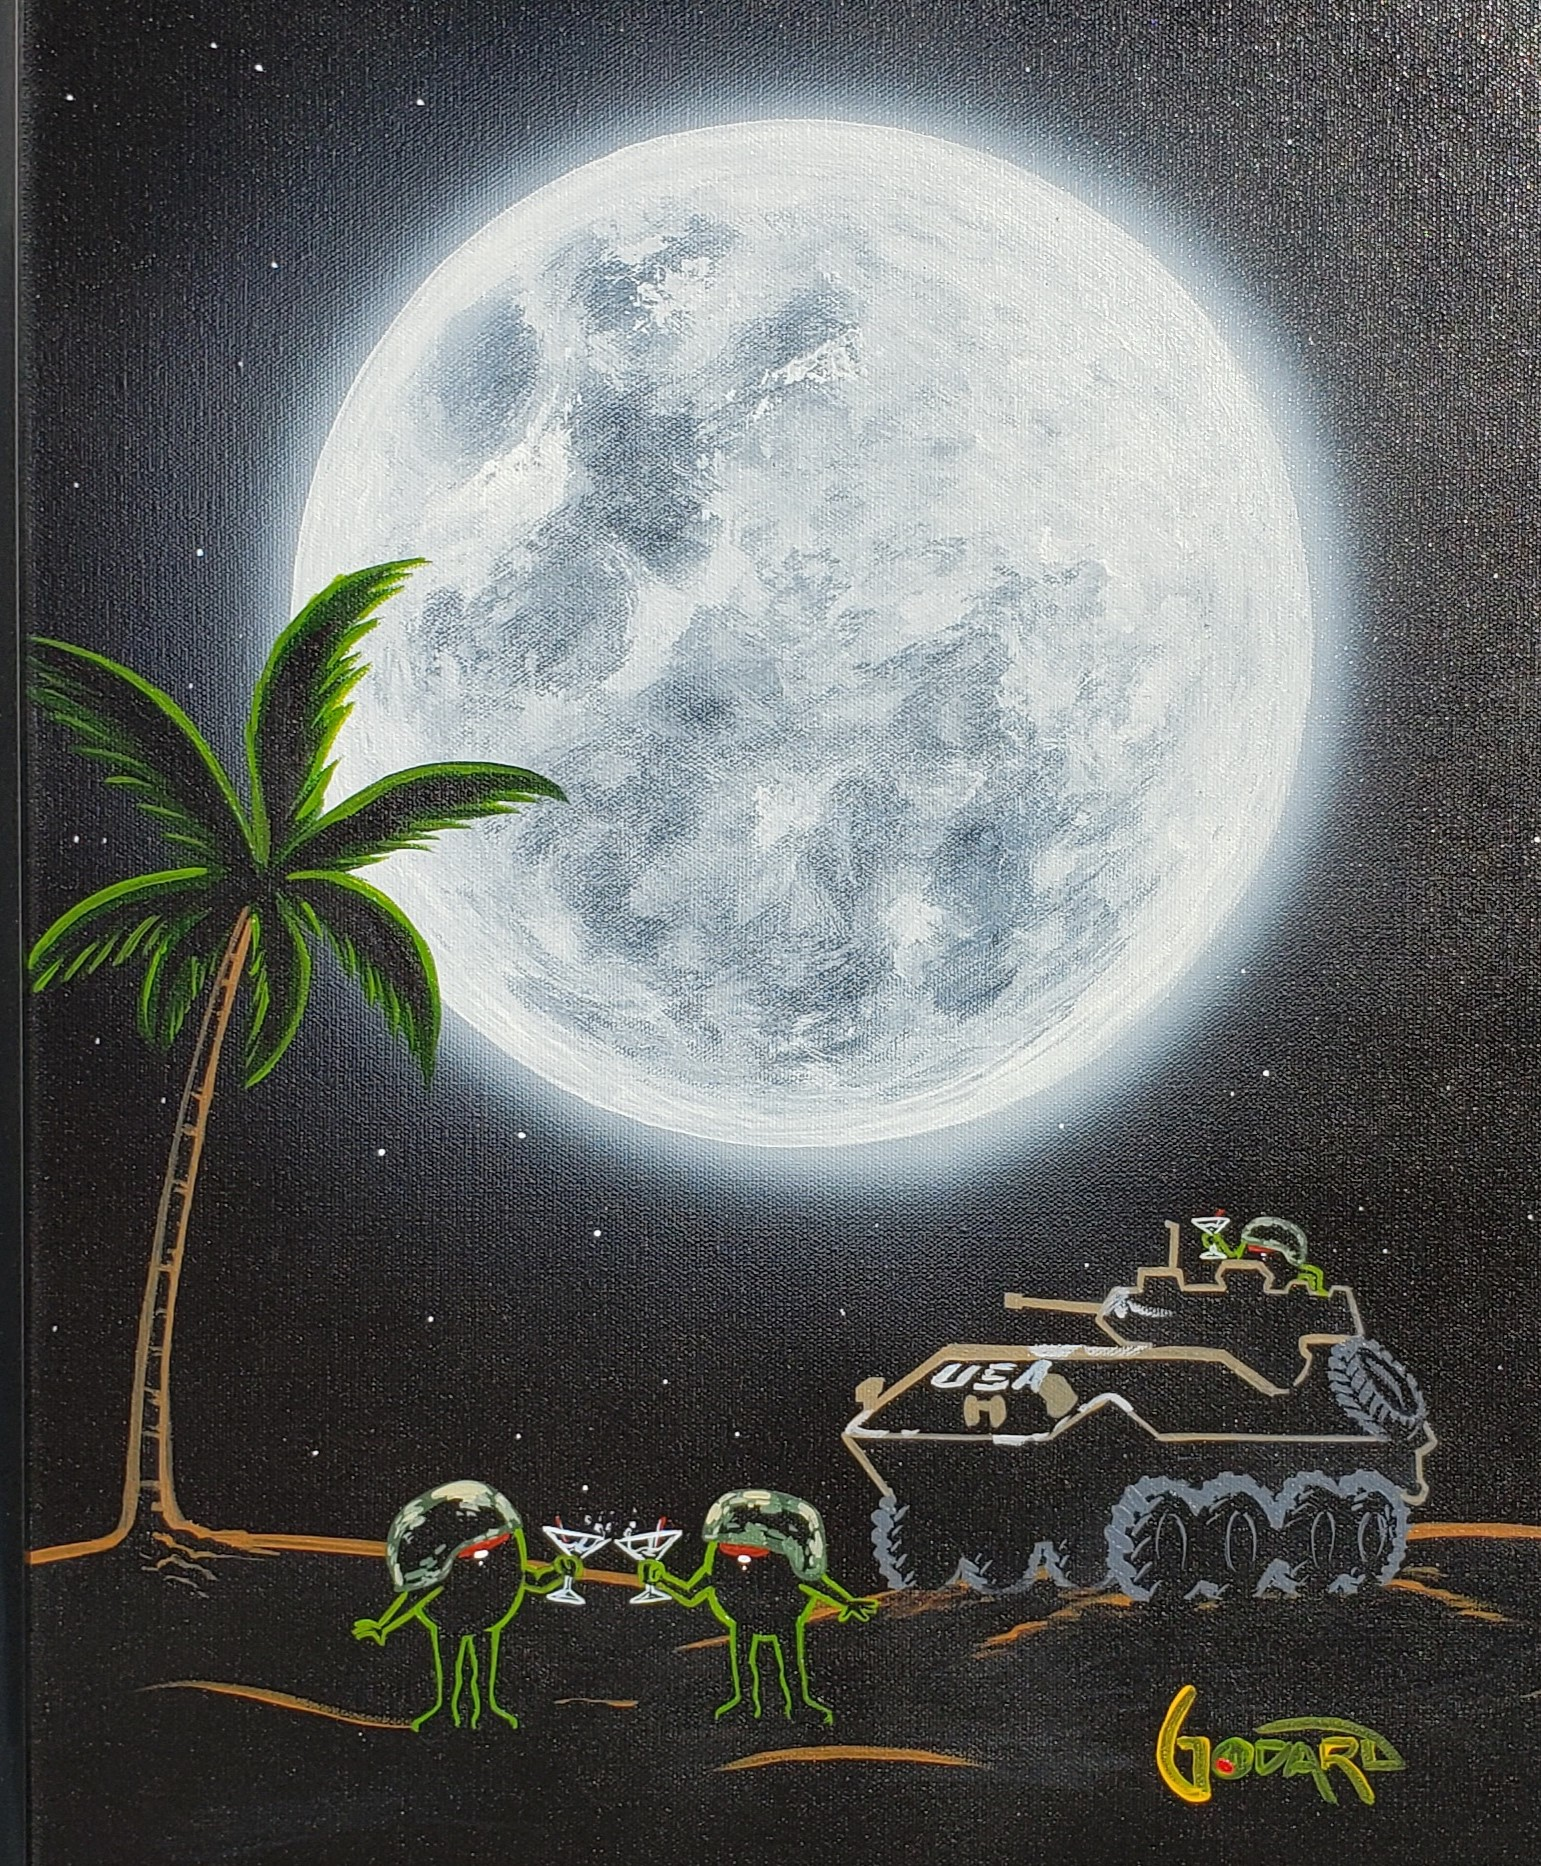 Tank Tini artwork by Michael Godard - art listed for sale on Artplode